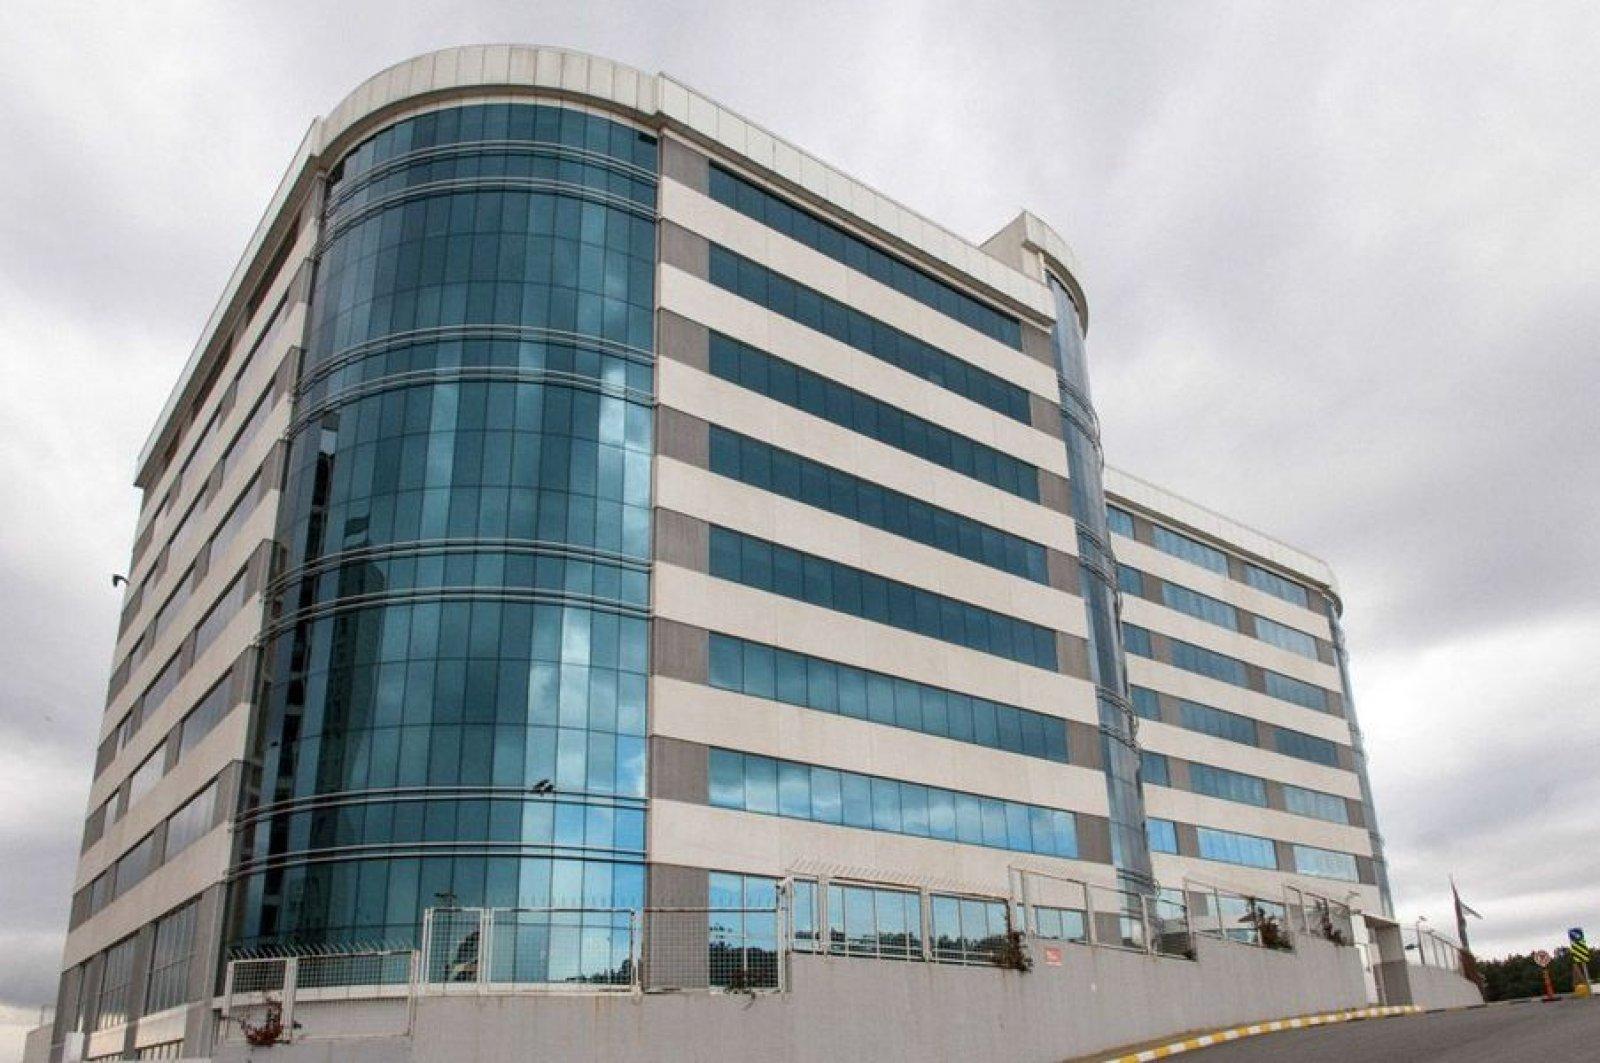 Unilever Genel Merkezi